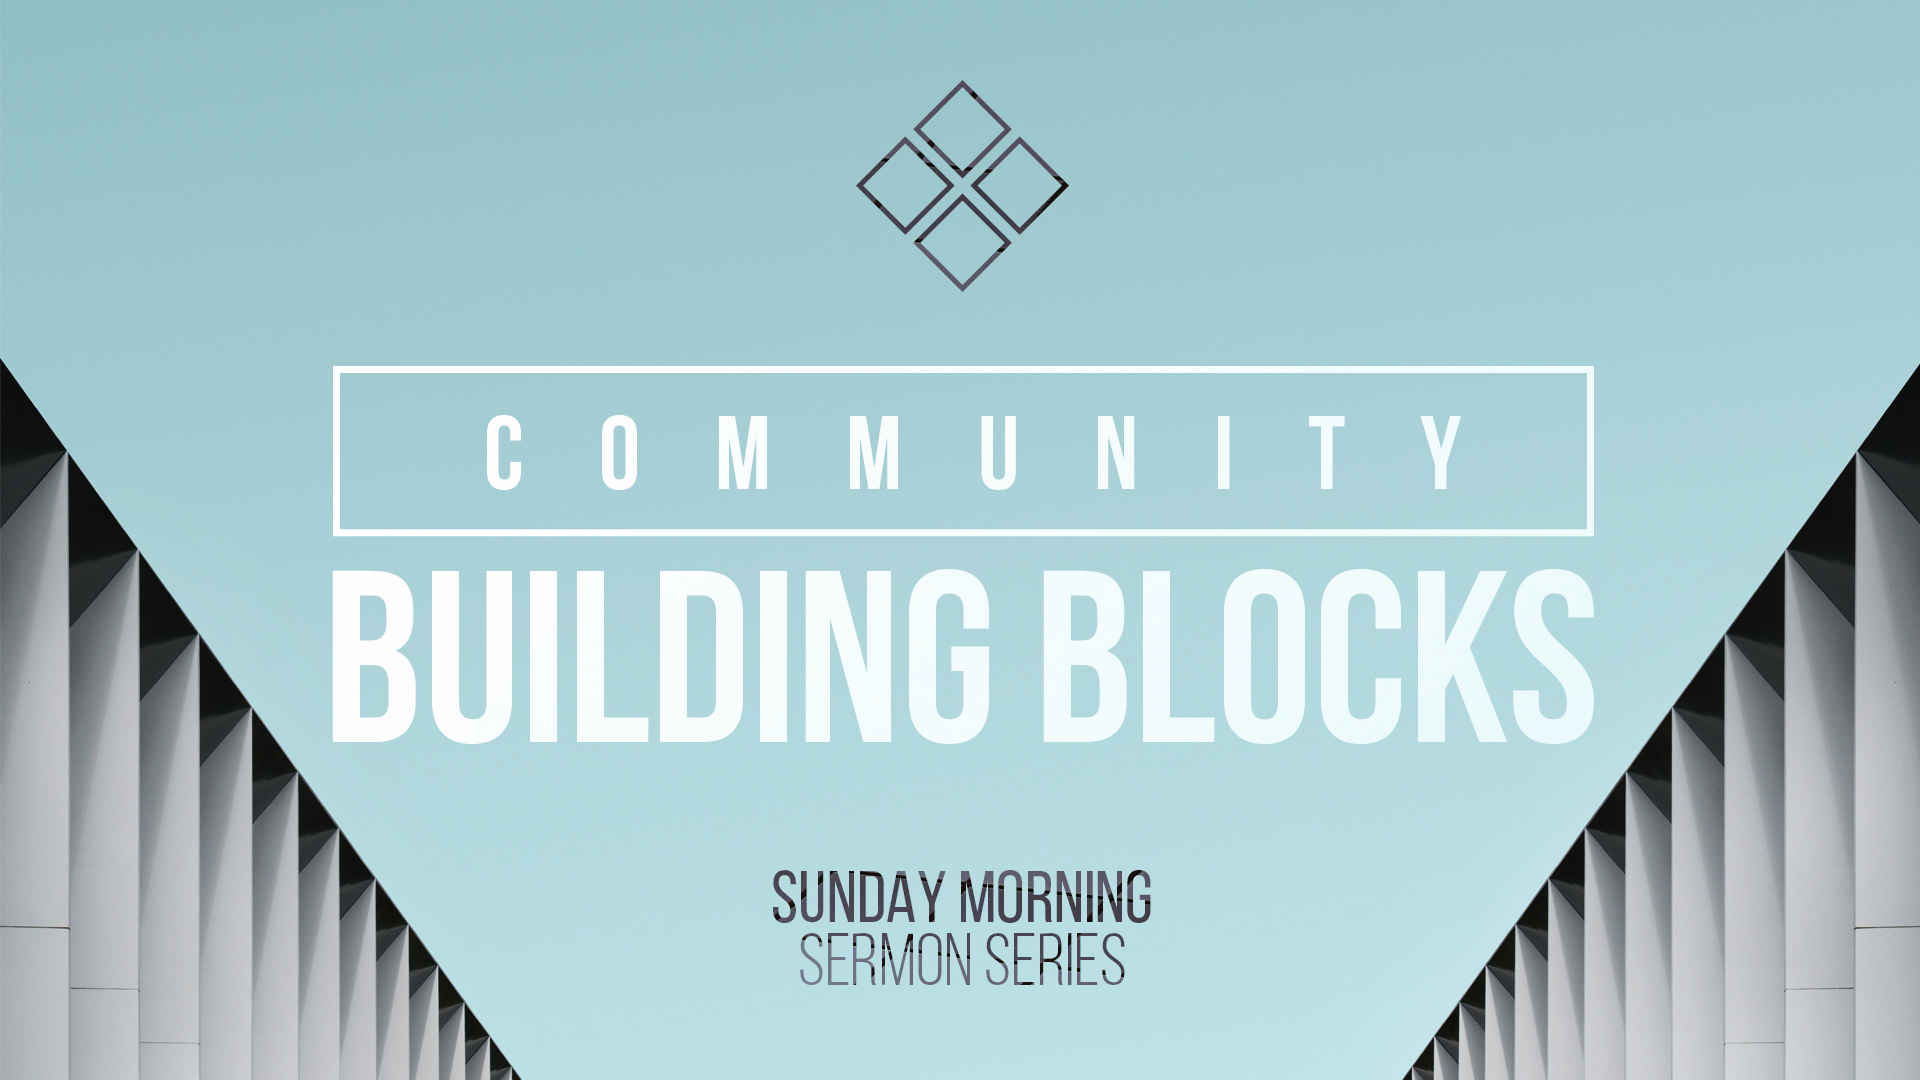 communitybuildingblocks.jpg